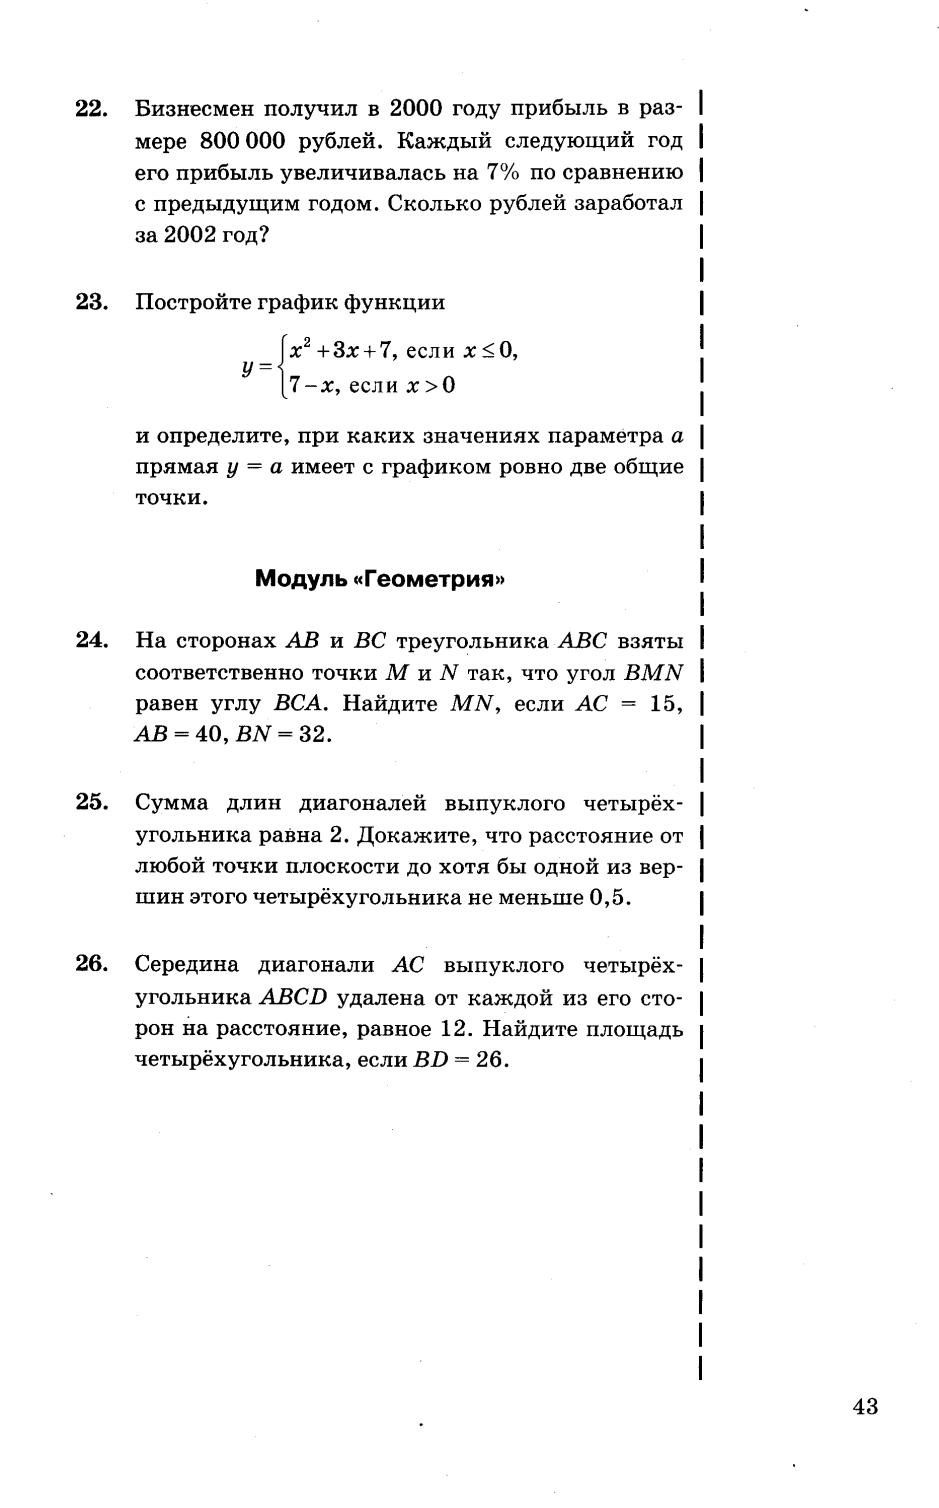 https://docs.google.com/viewer?pid=explorer&srcid=0Bw_f54pvrxEtbldKNGgyaFE3TDg&chrome=false&docid=e803bf4555b2fe7a8e01072ad16bc93b%7Cc9acad21277b9c8c76d1236b5bcea6e2&a=bi&pagenumber=44&w=939